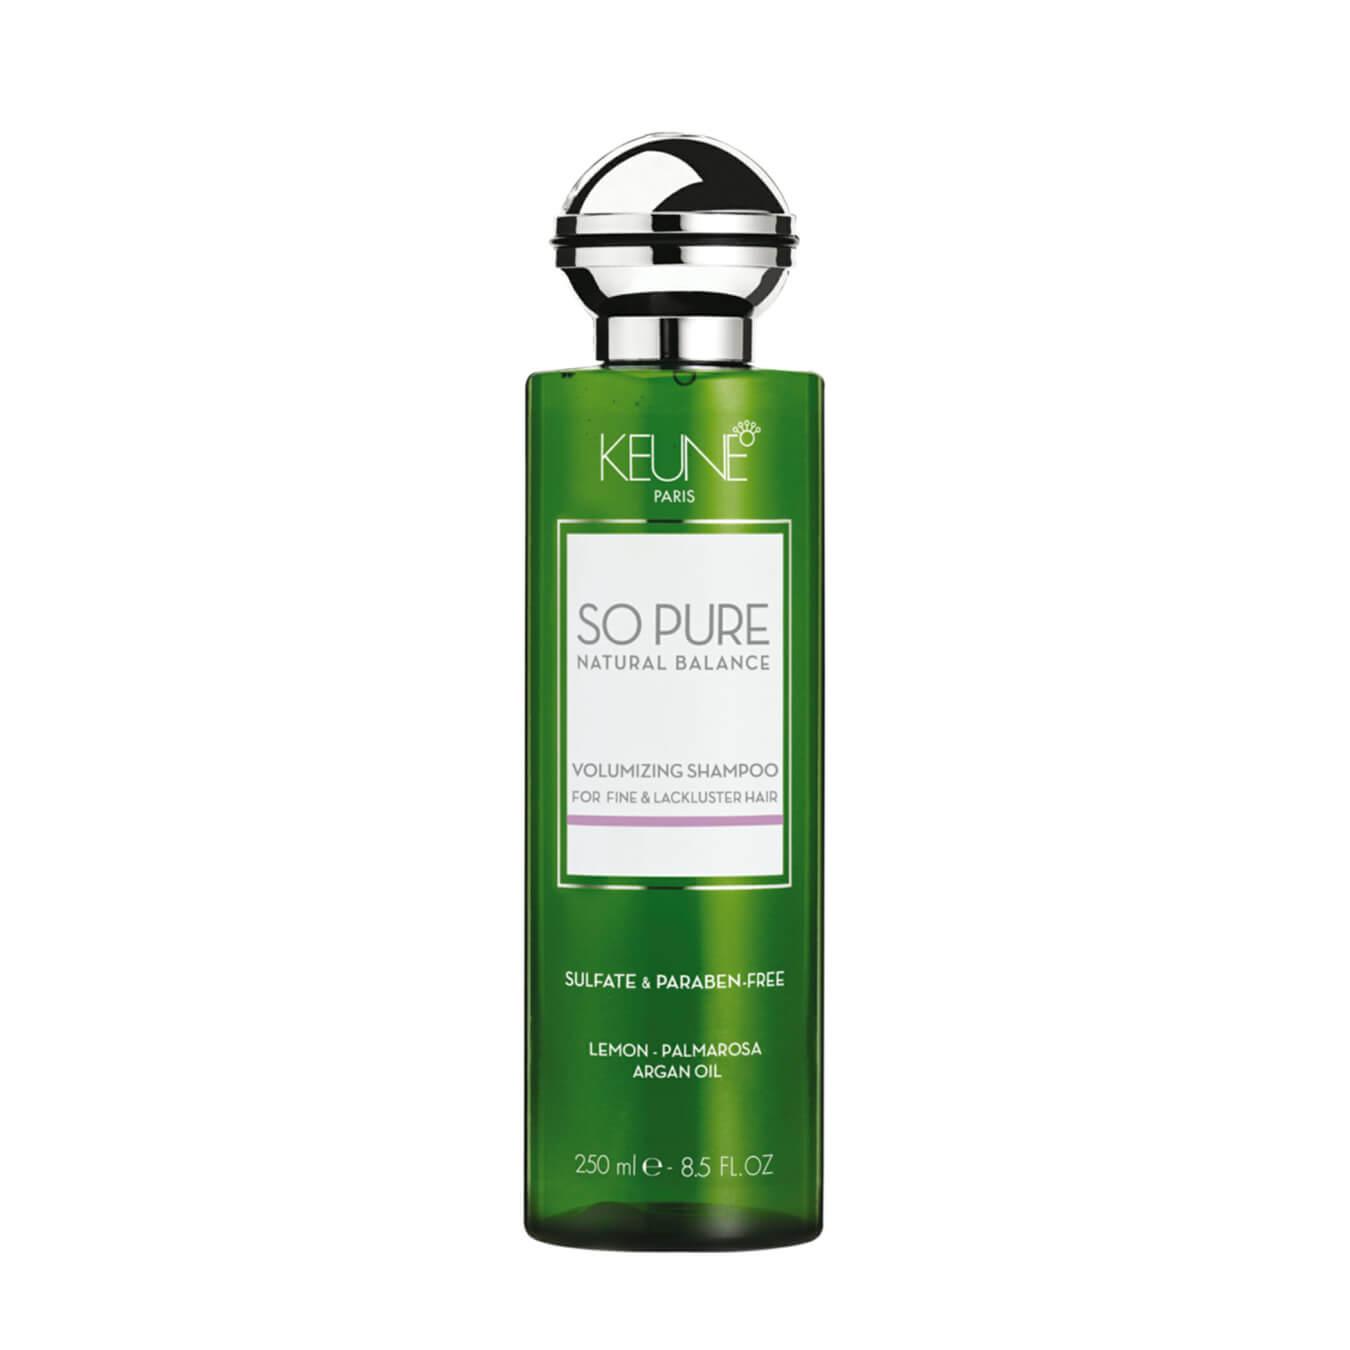 Kauf Keune So Pure Volumizing Shampoo 250ml